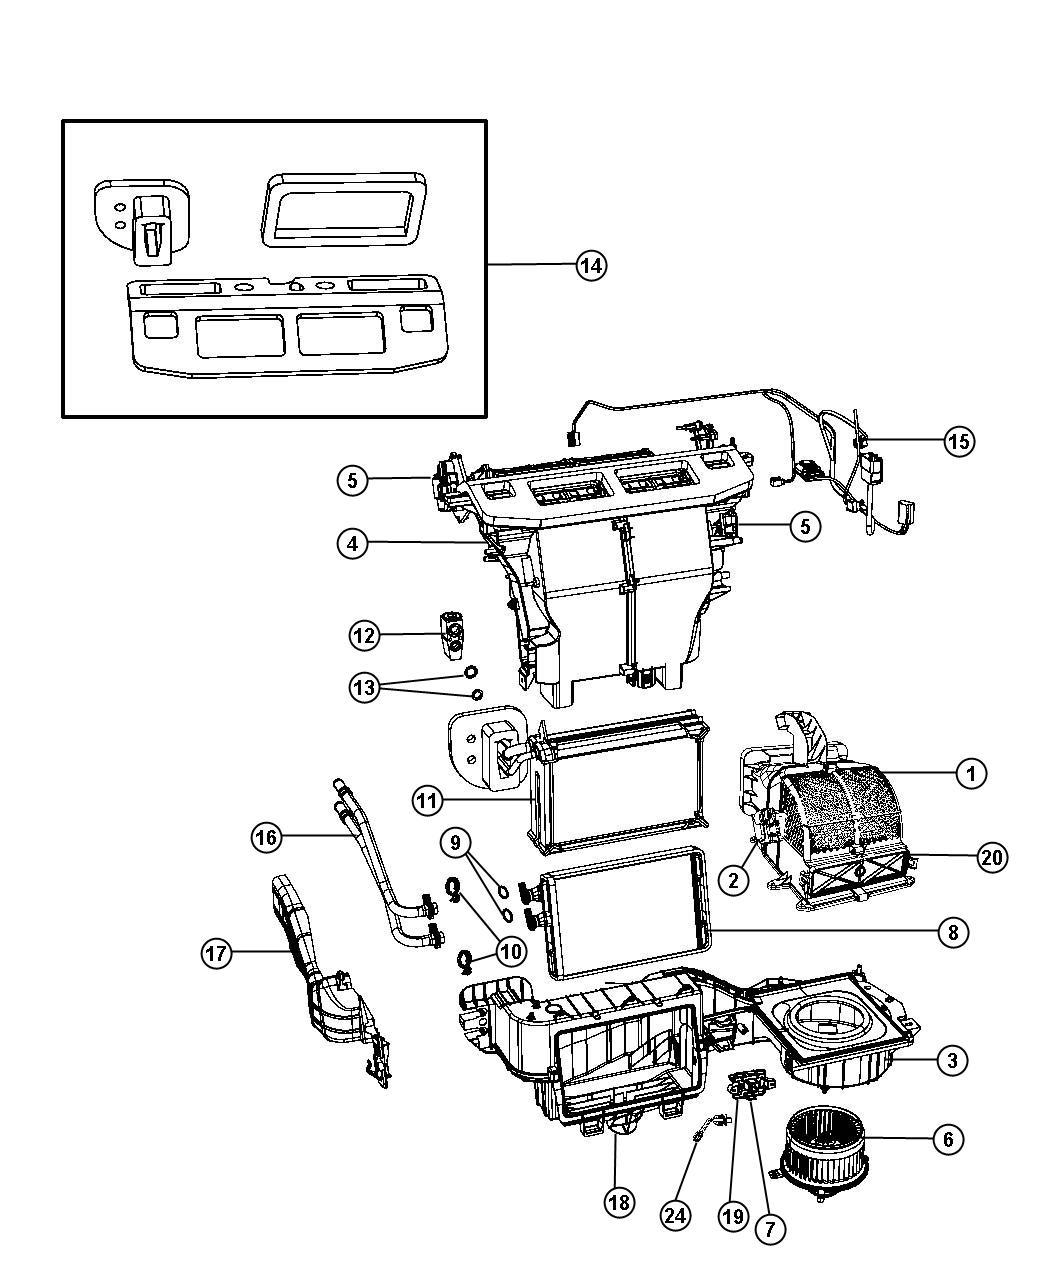 Ford Freestar Blower Diagram